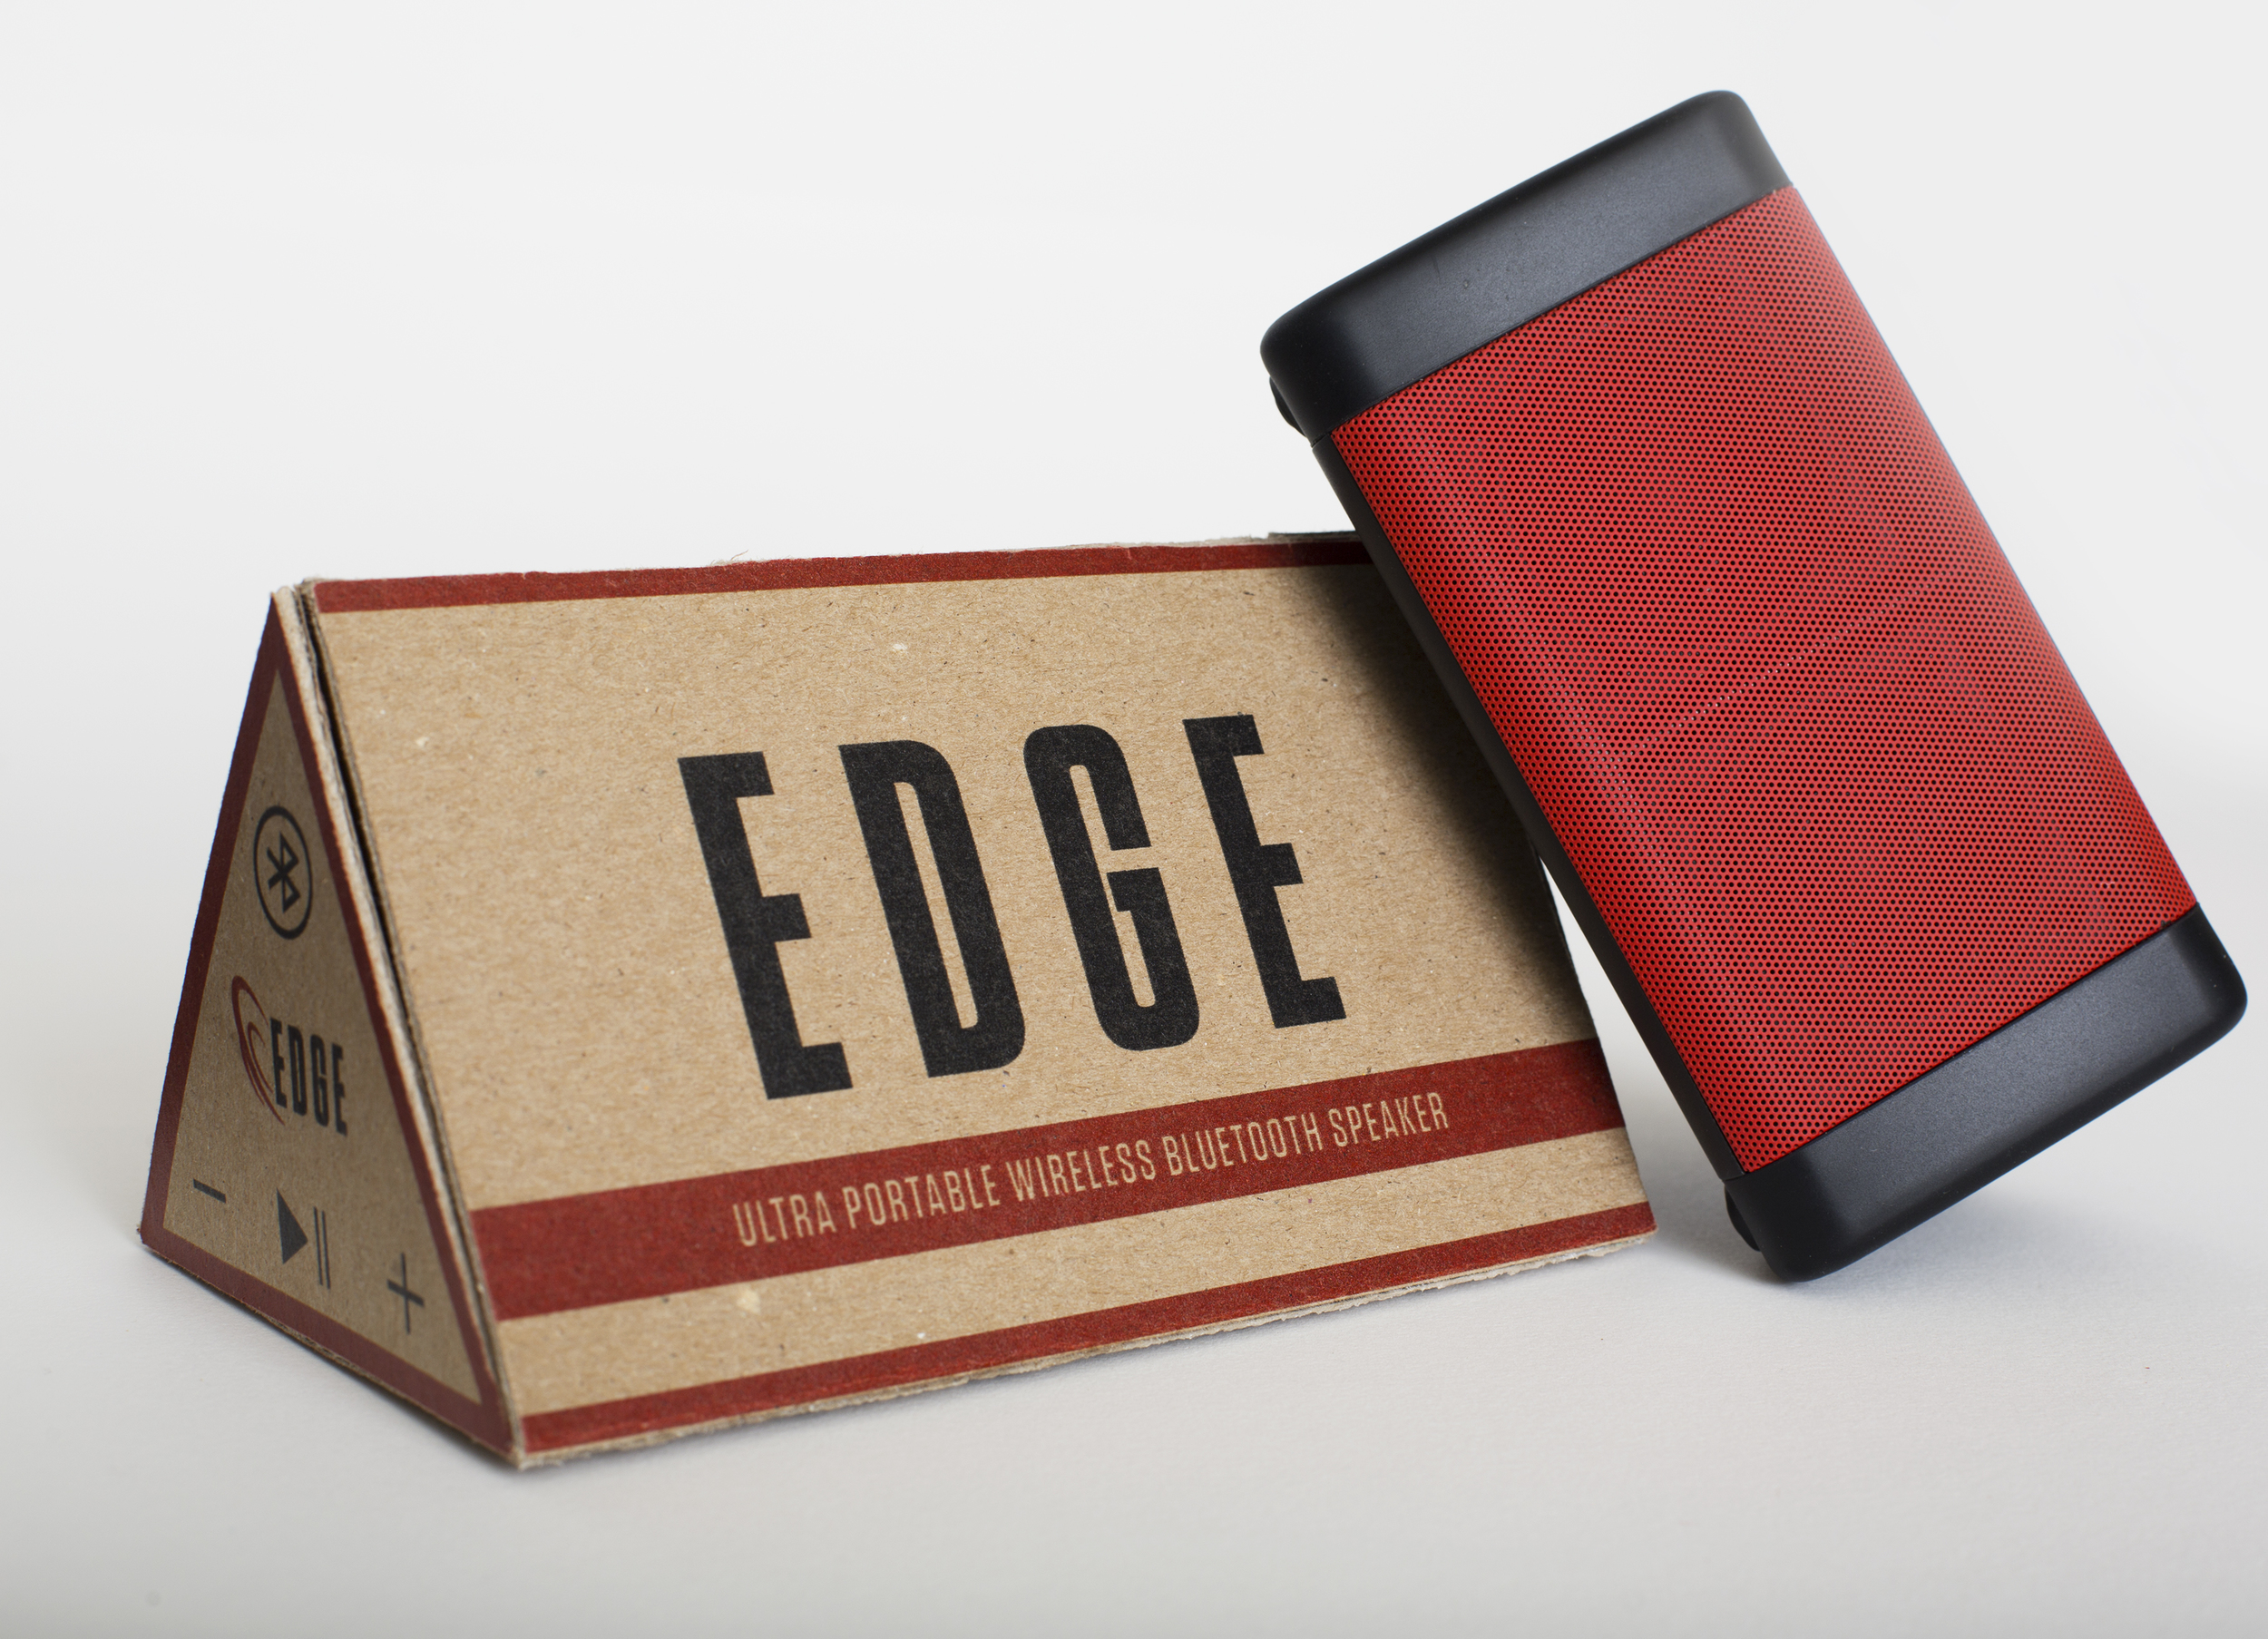 edge_4.jpg